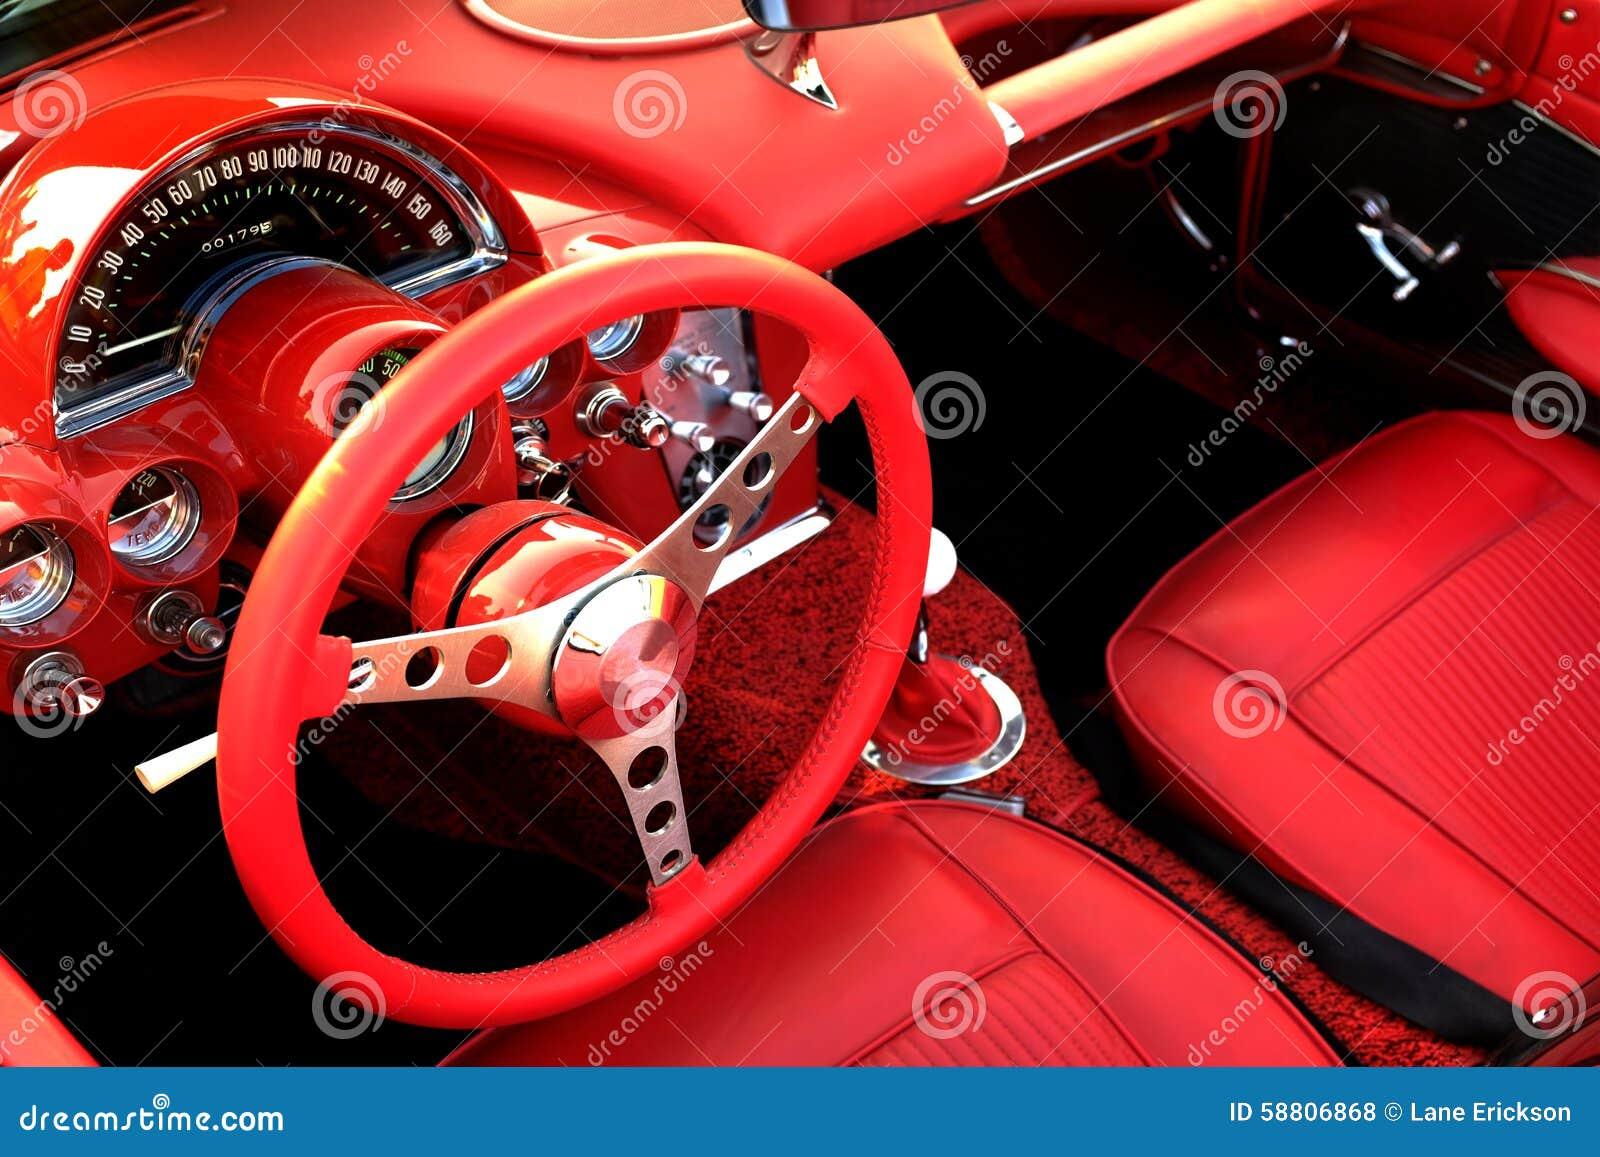 Rotes sport auto innenlenkrad stockfoto bild von